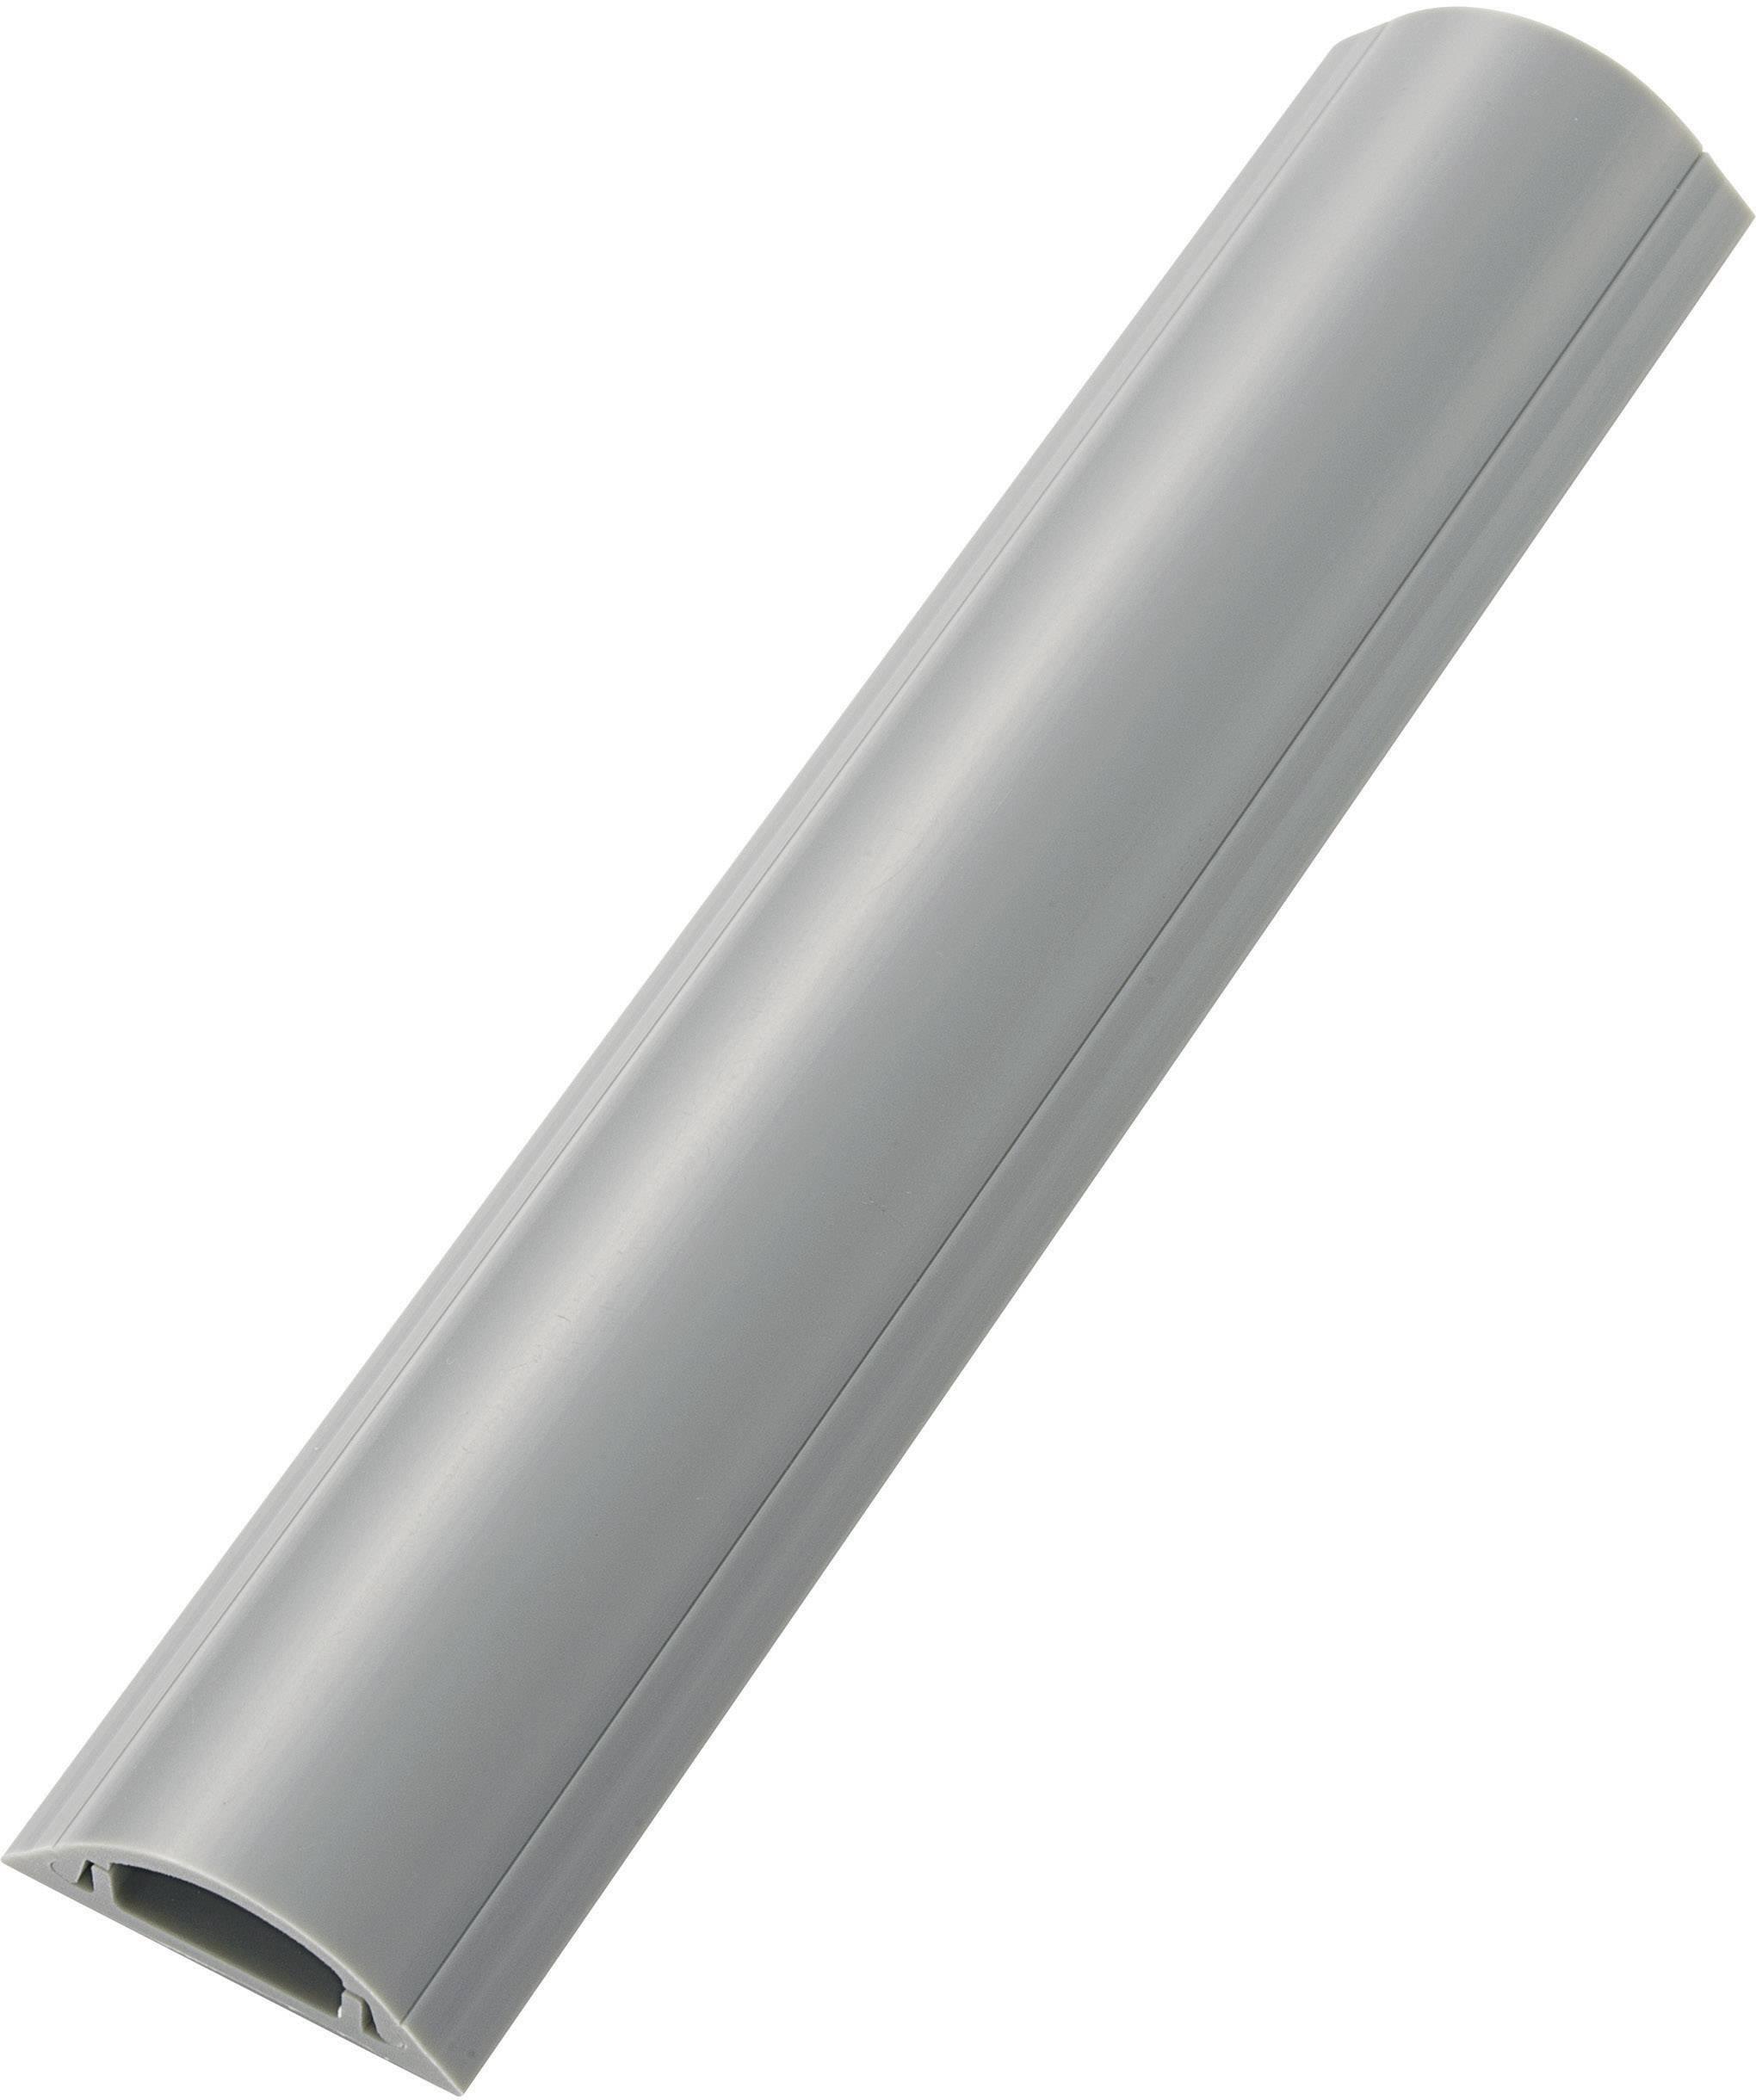 Kabelový můstek TRU COMPONENTS TC-RDAR40AWM203, (d x š x v) 1000 x 38.50 x 11.50 mm, šedá, 1 ks